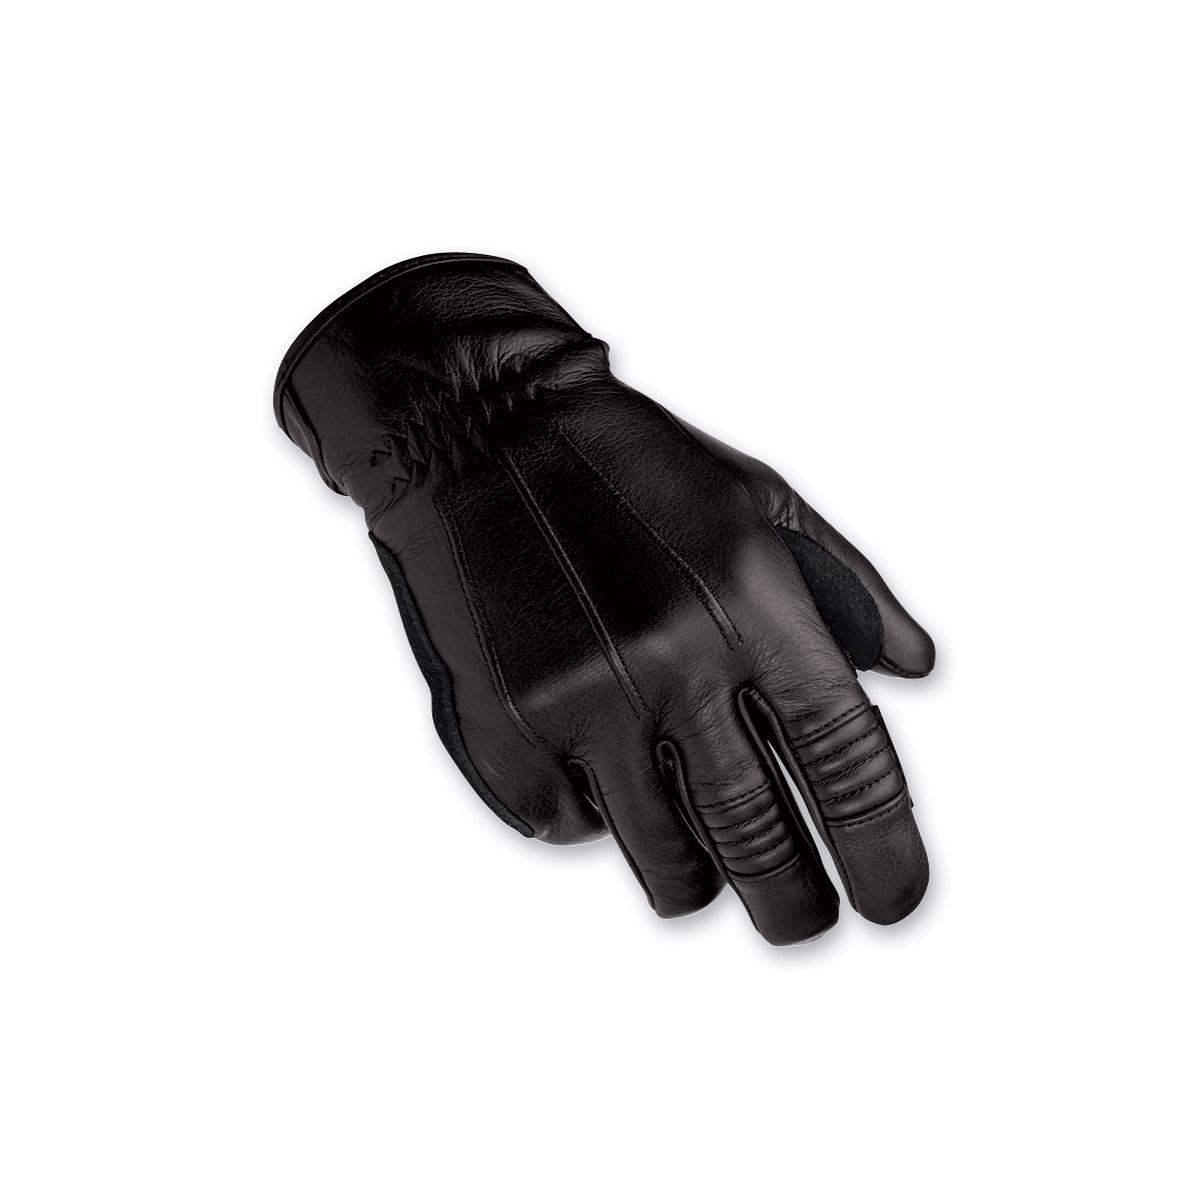 Biltwell Inc. Men's Black Work Gloves